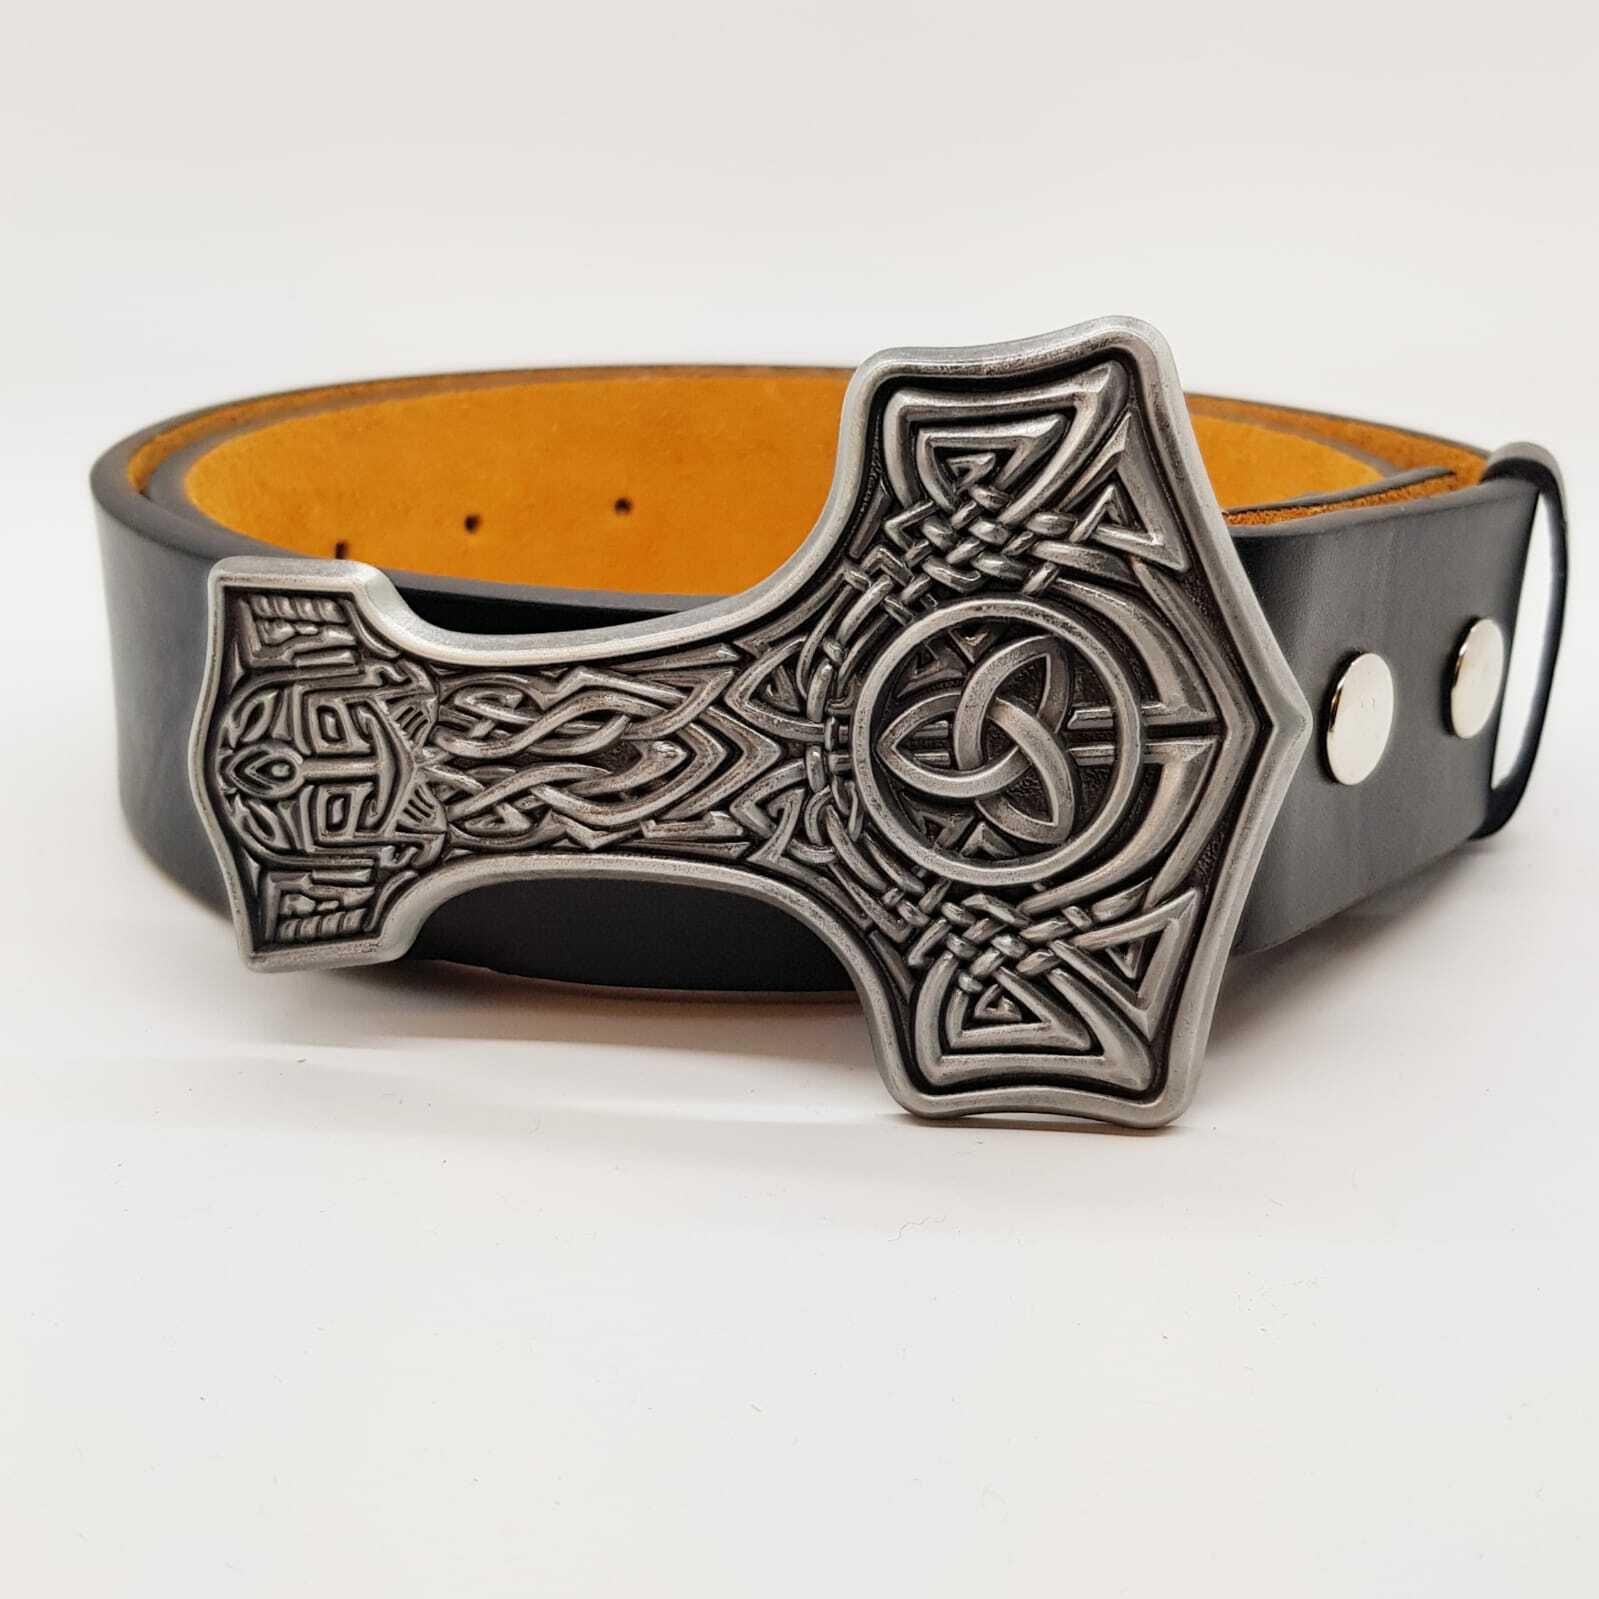 Thors Hammer Belt & Buckle Mjolnir Viking Odin Celtic Knotwork Pagan feeanddave